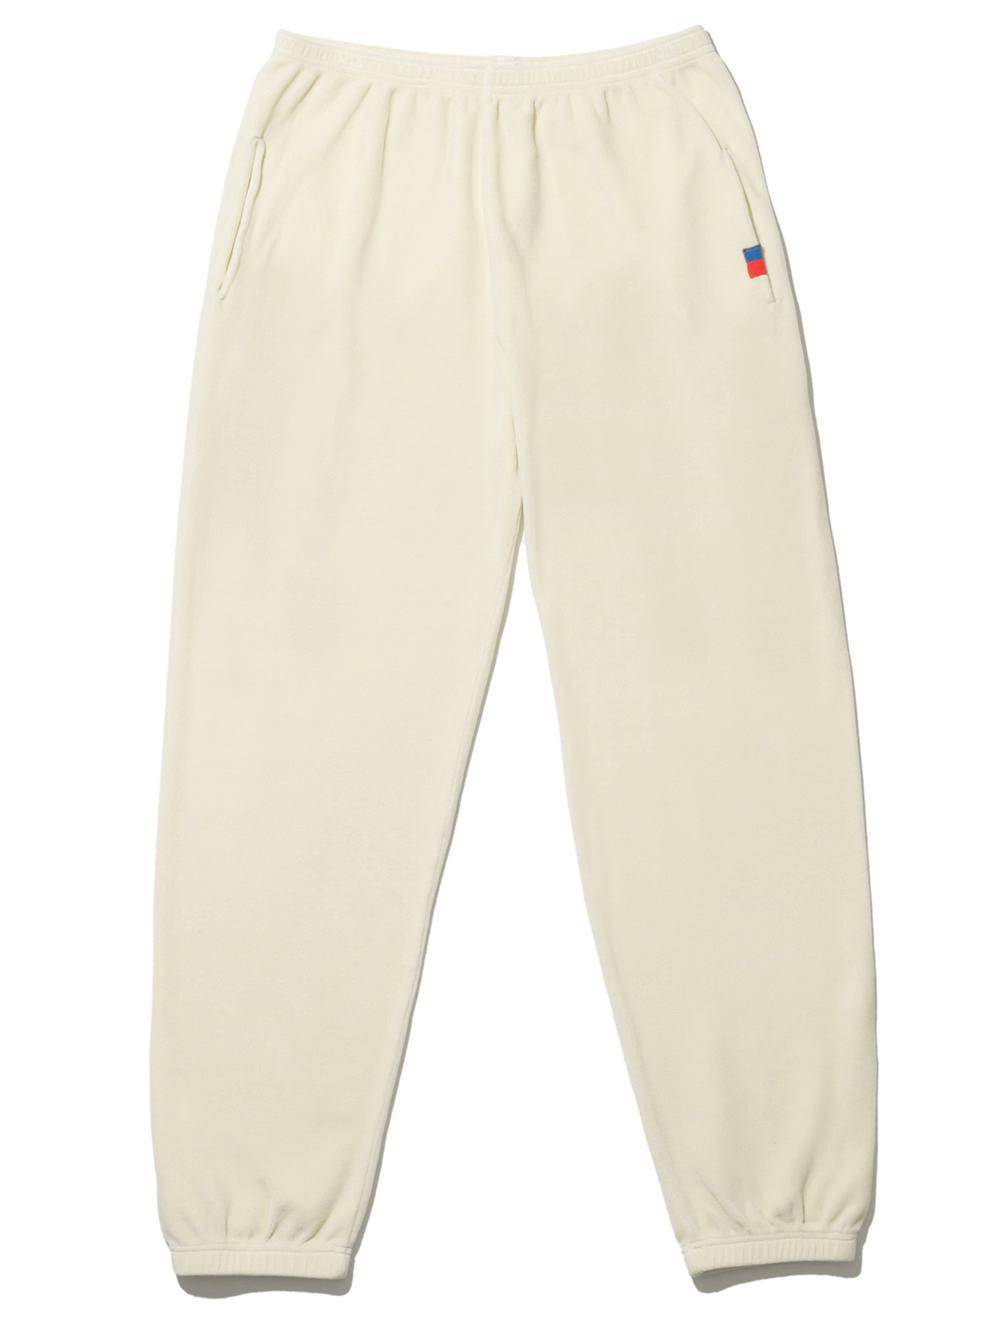 The Velour Sweatpants Item # SWP02F3